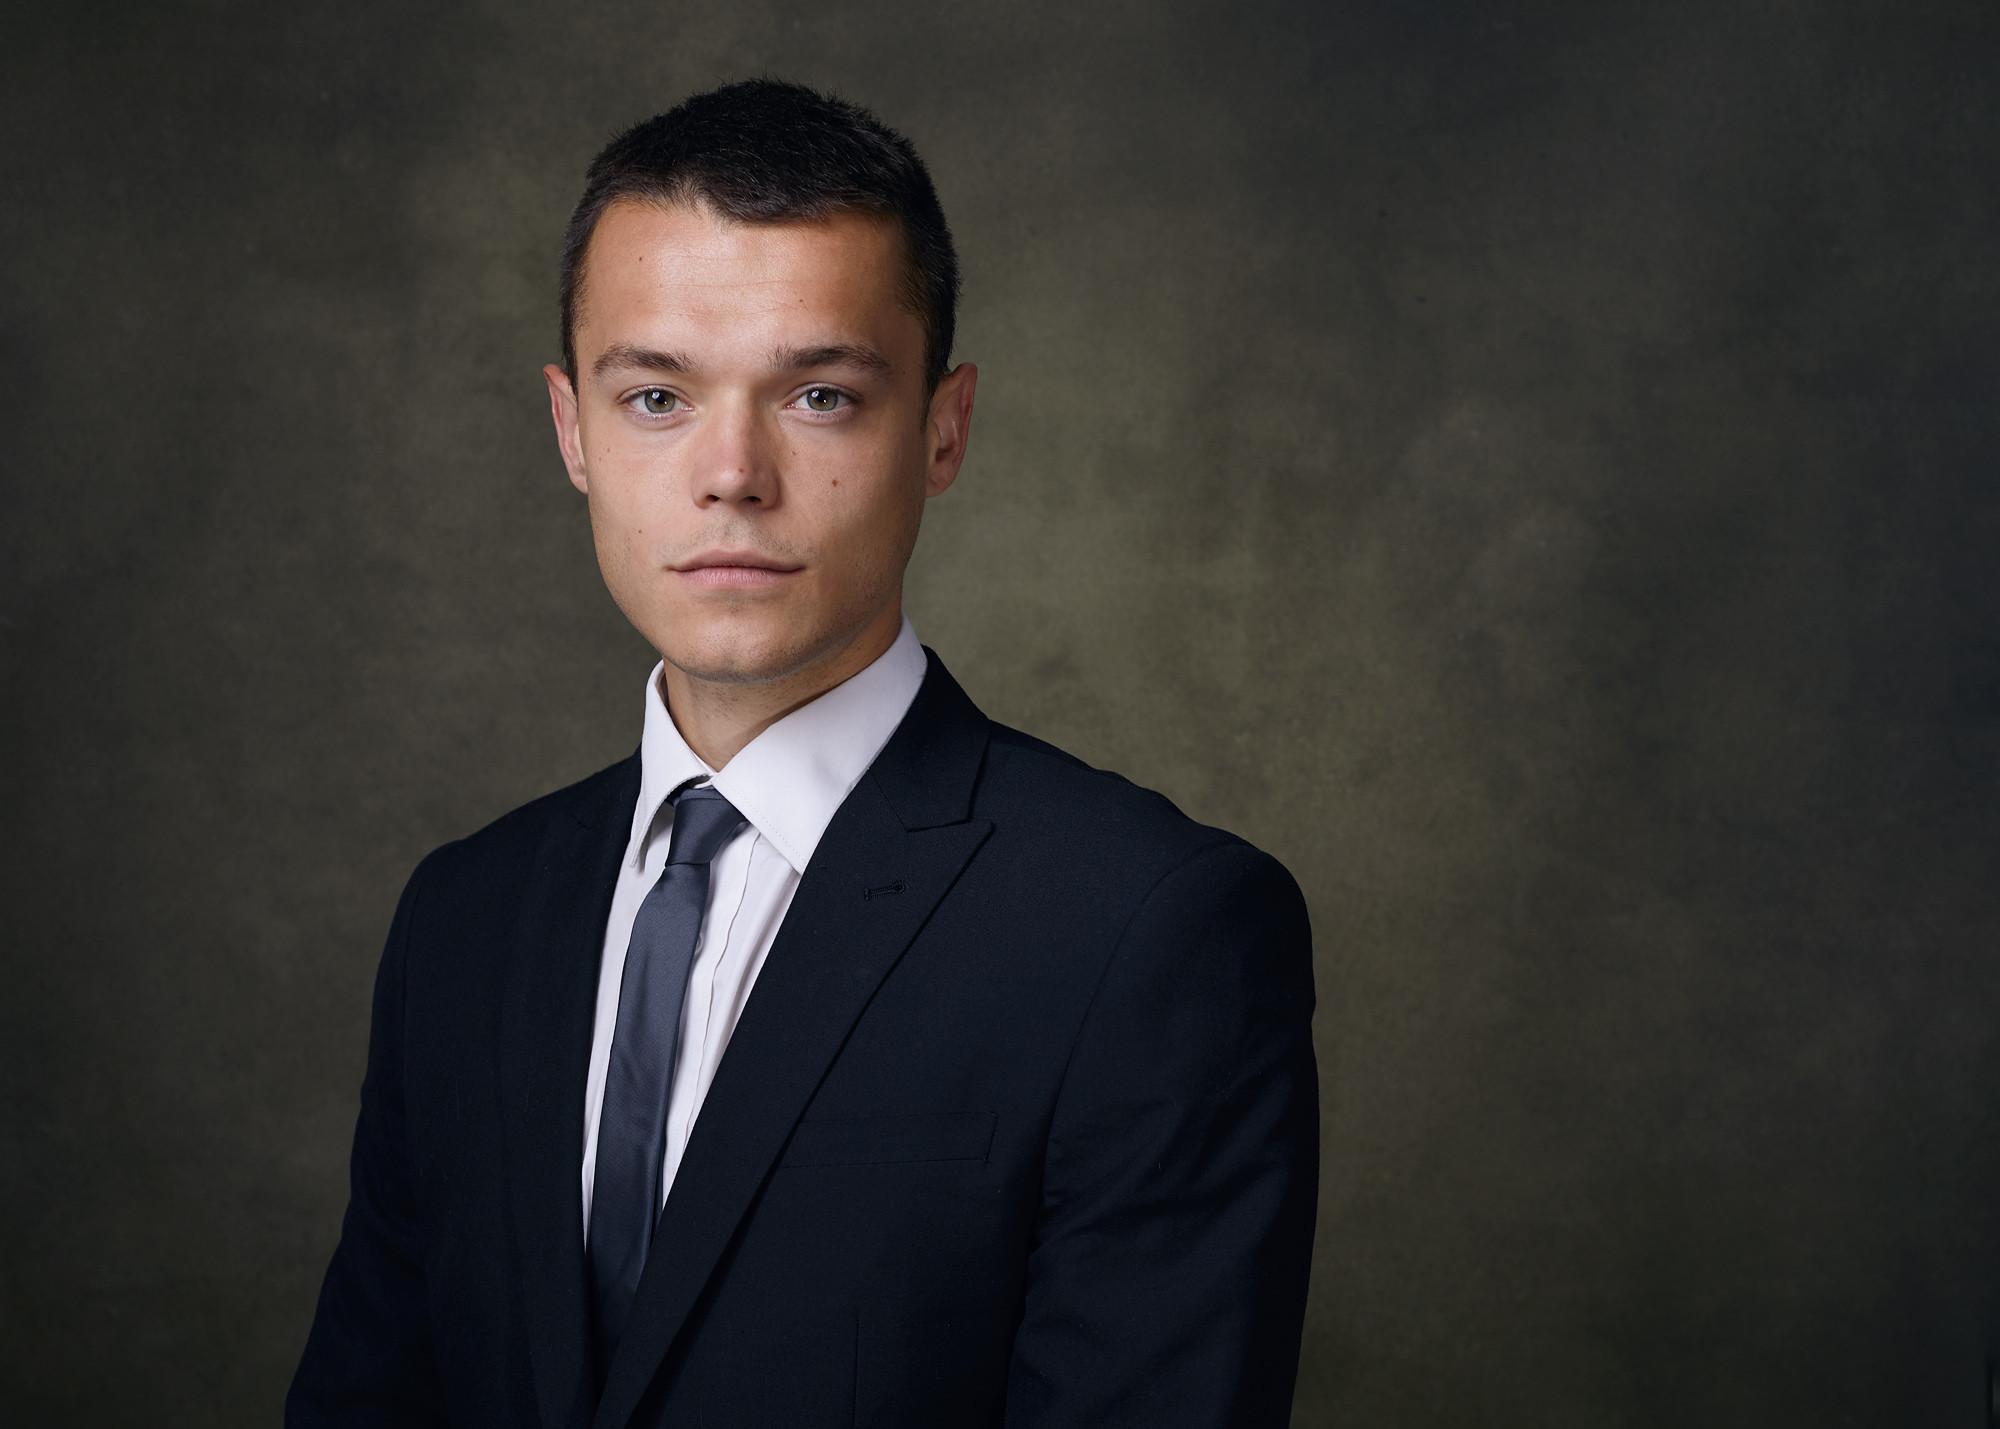 Premium Business Portraits